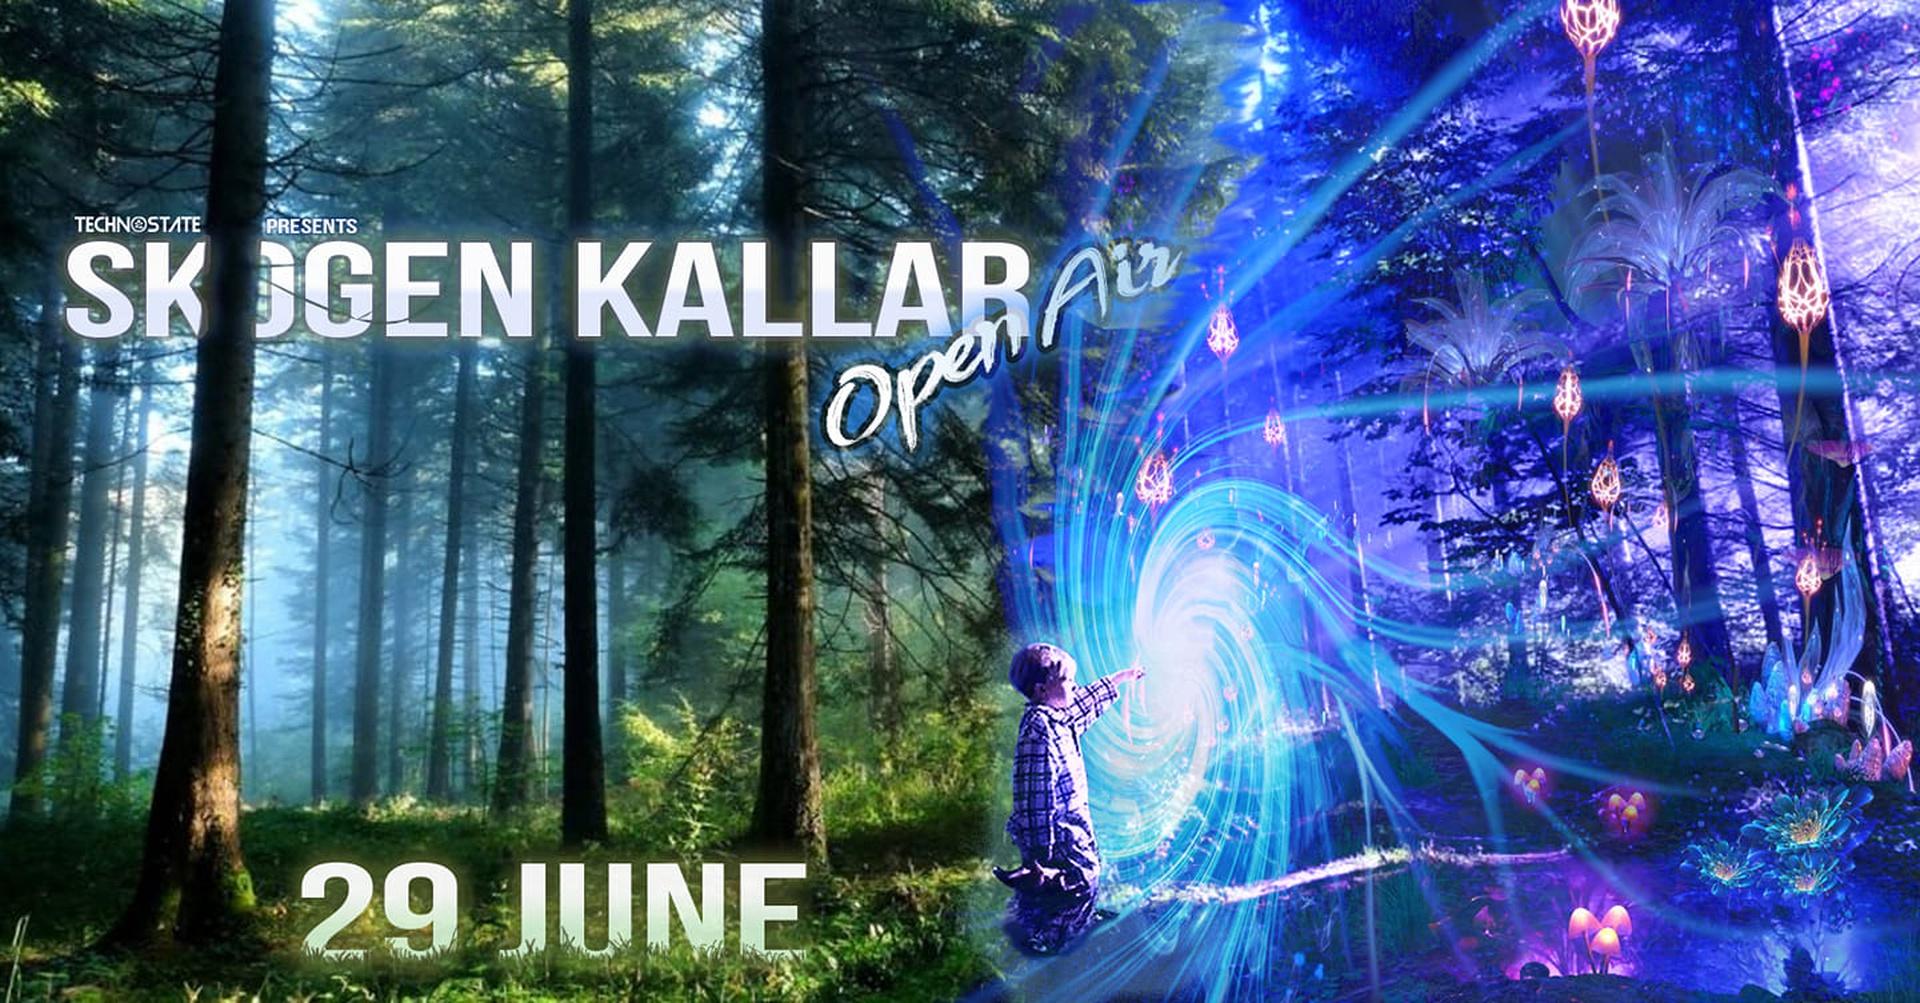 Event: Skogen Kallar 2019